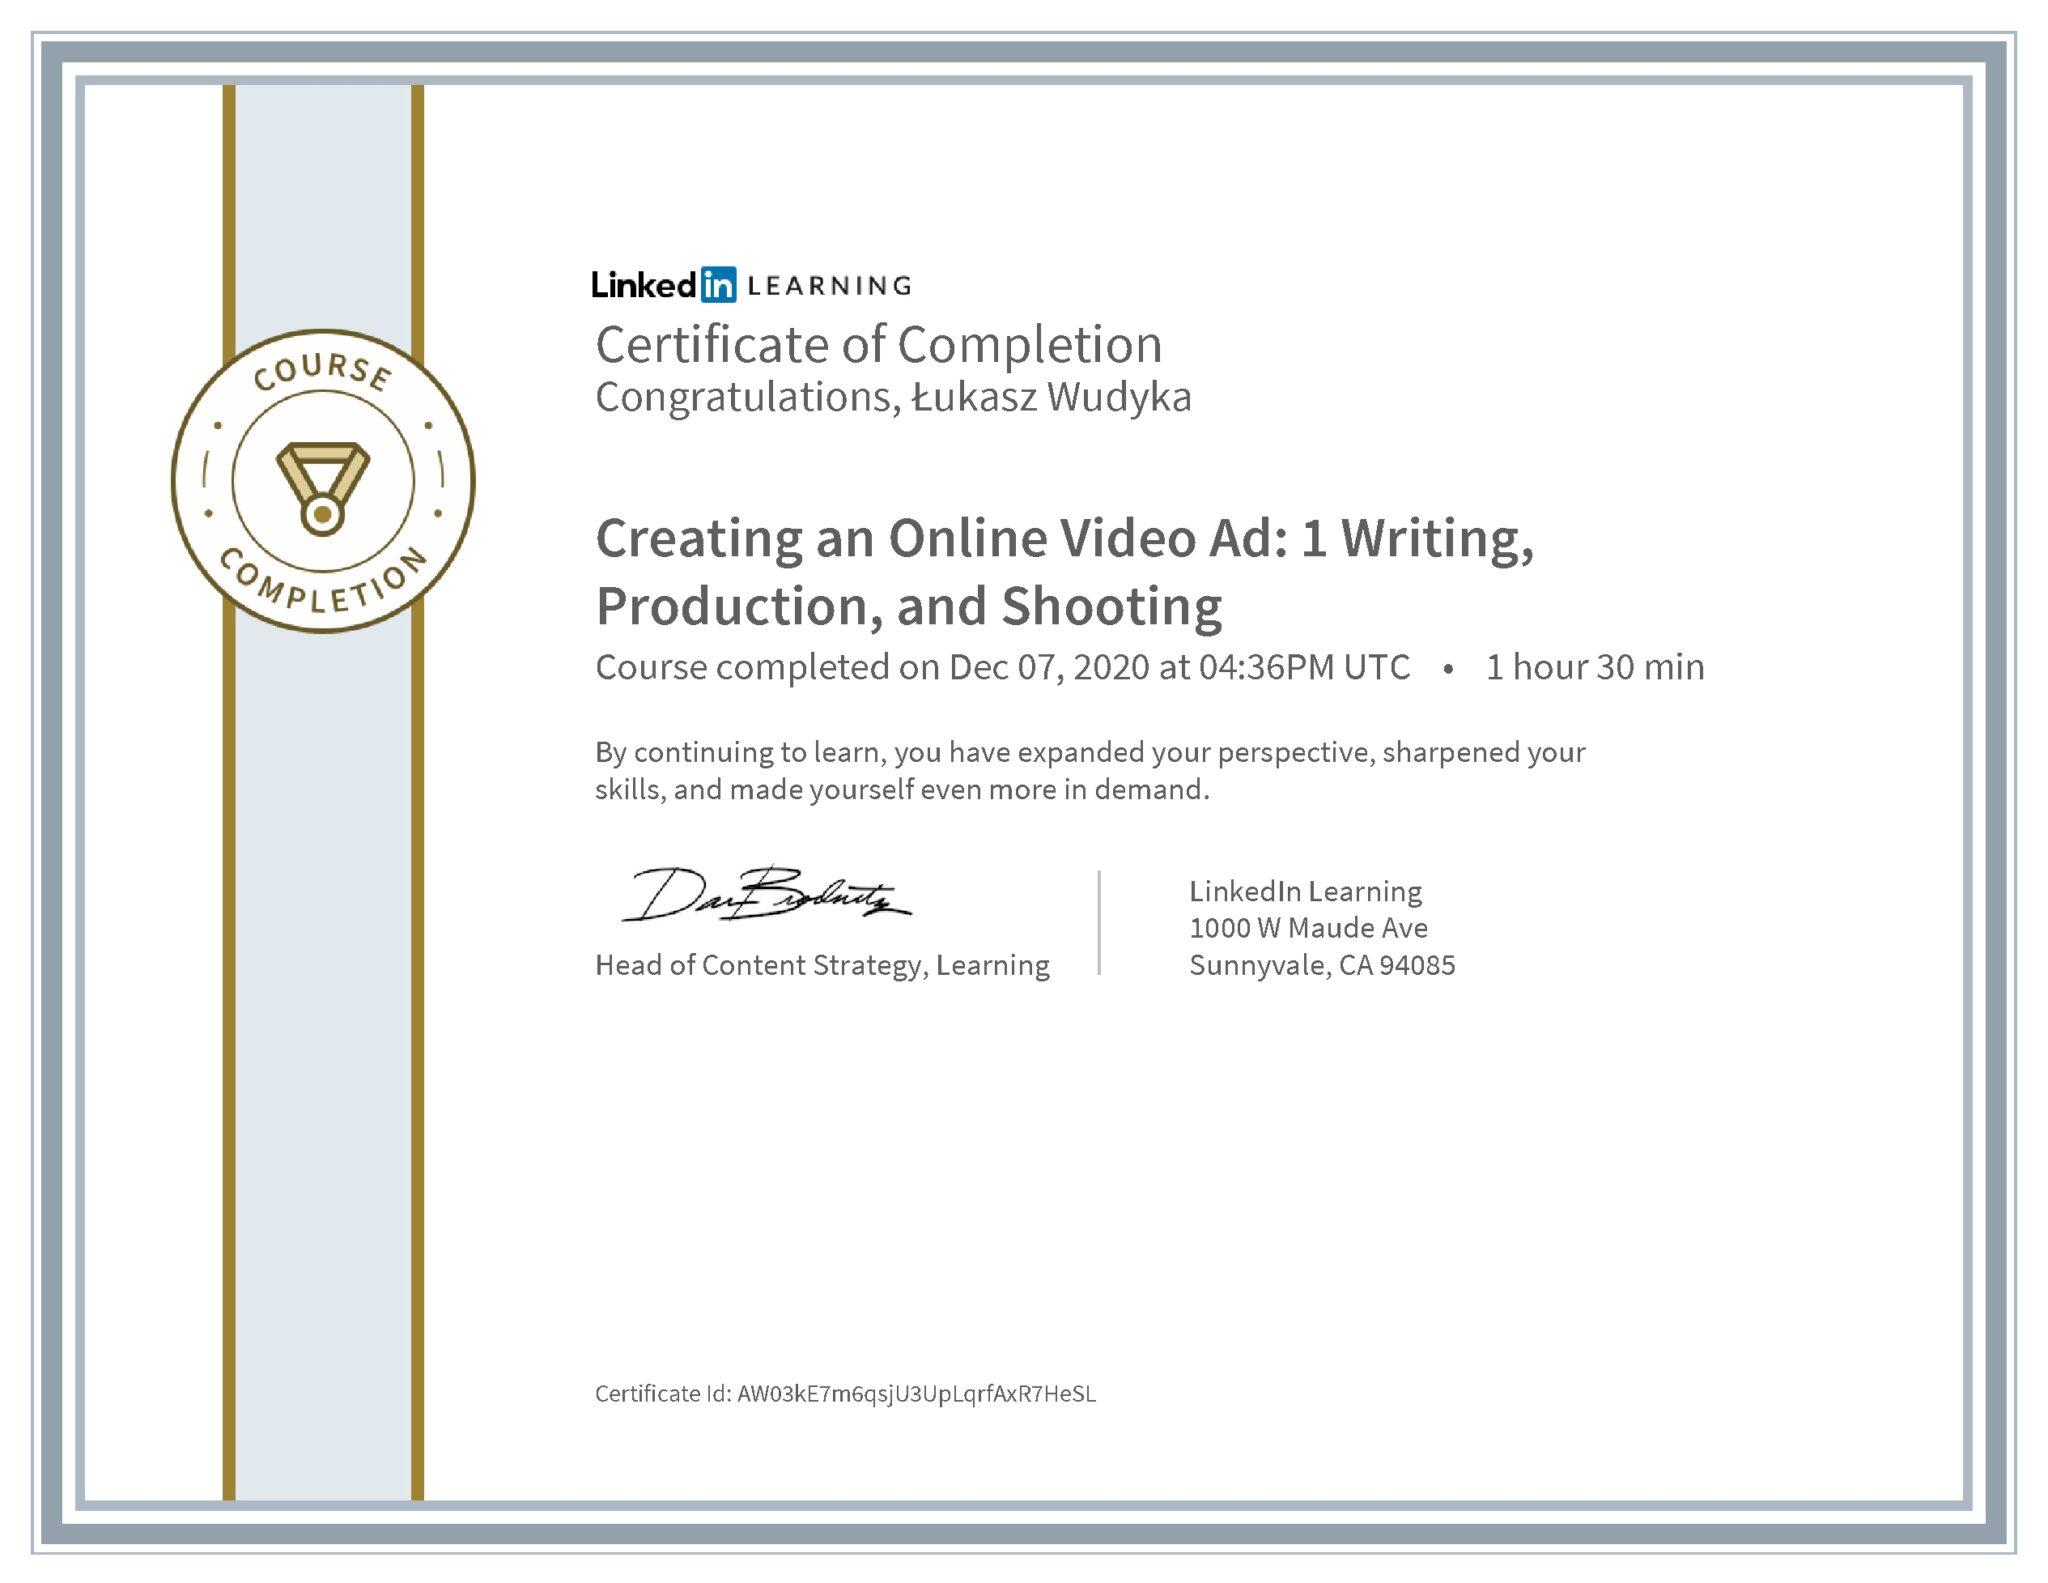 Łukasz Wudyka certyfikat LinkedIn Creating an Online Video Ad: 1 Writing, Production, and Shooting